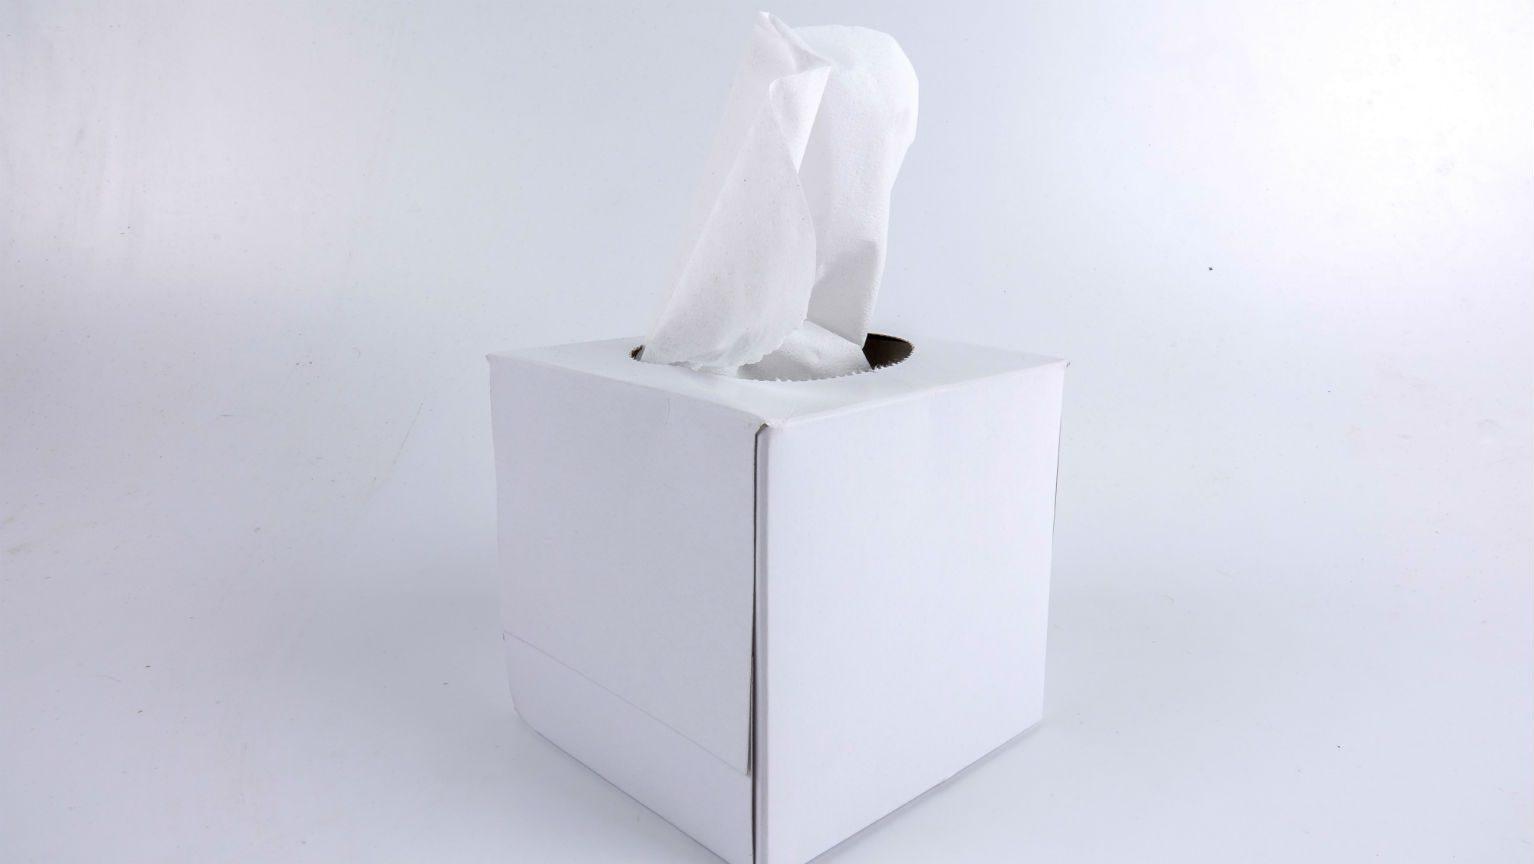 Box of tissues